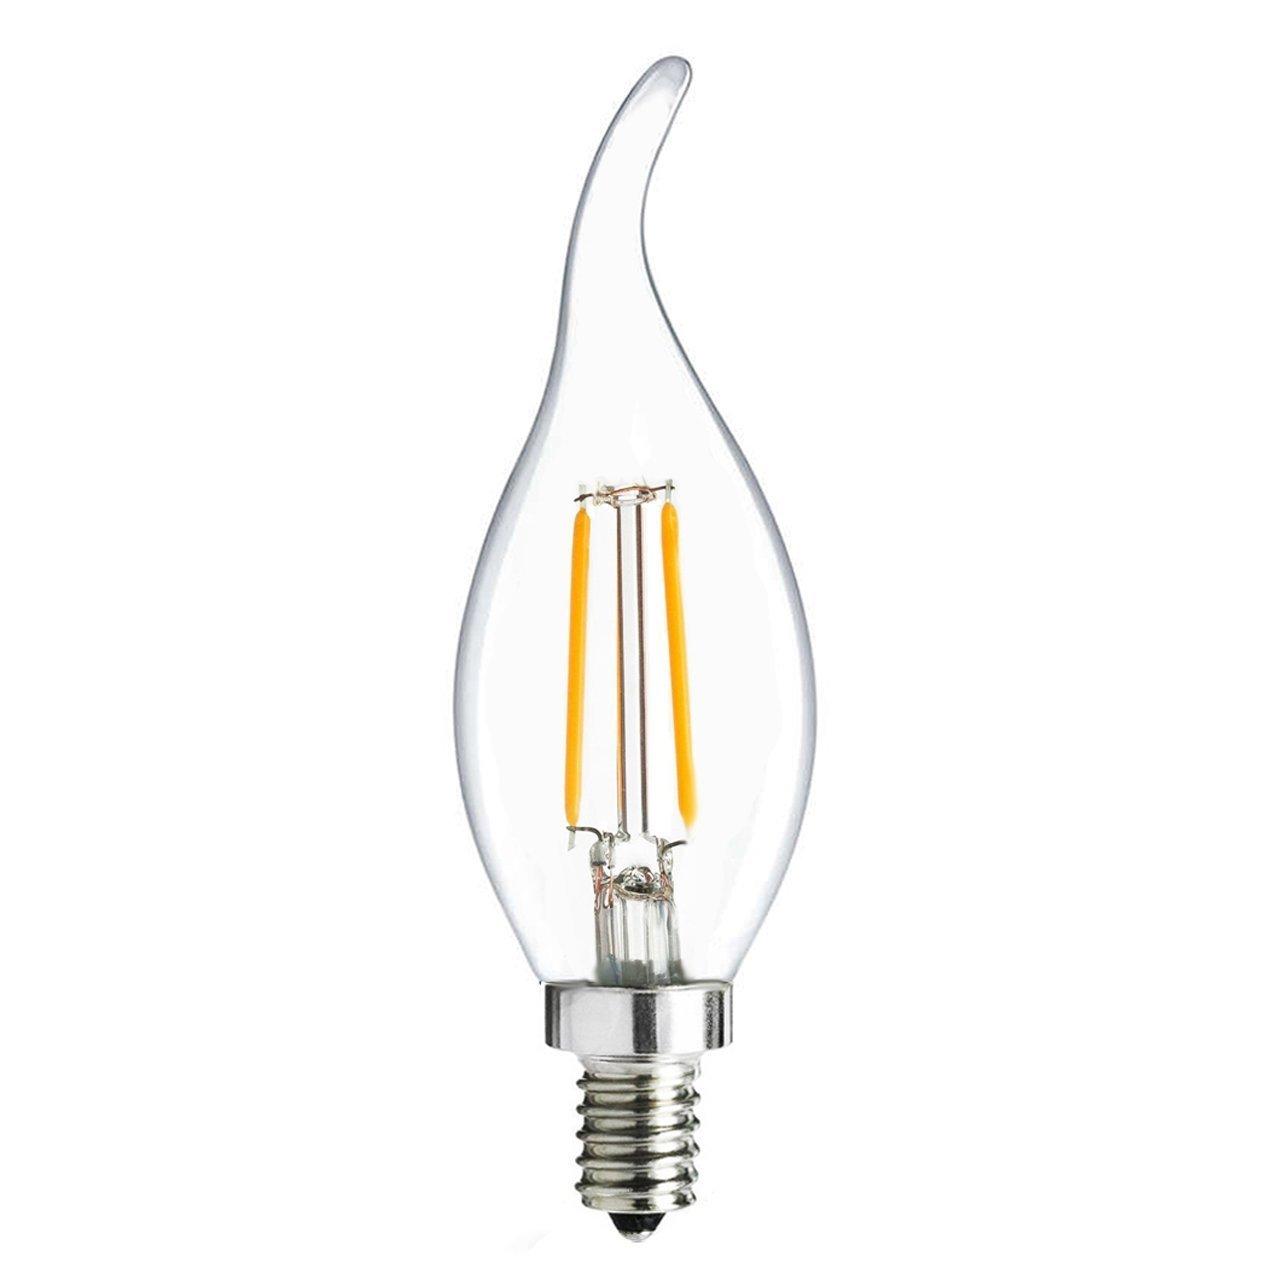 cheap 150w 200w clear bulbs  find 150w 200w clear bulbs